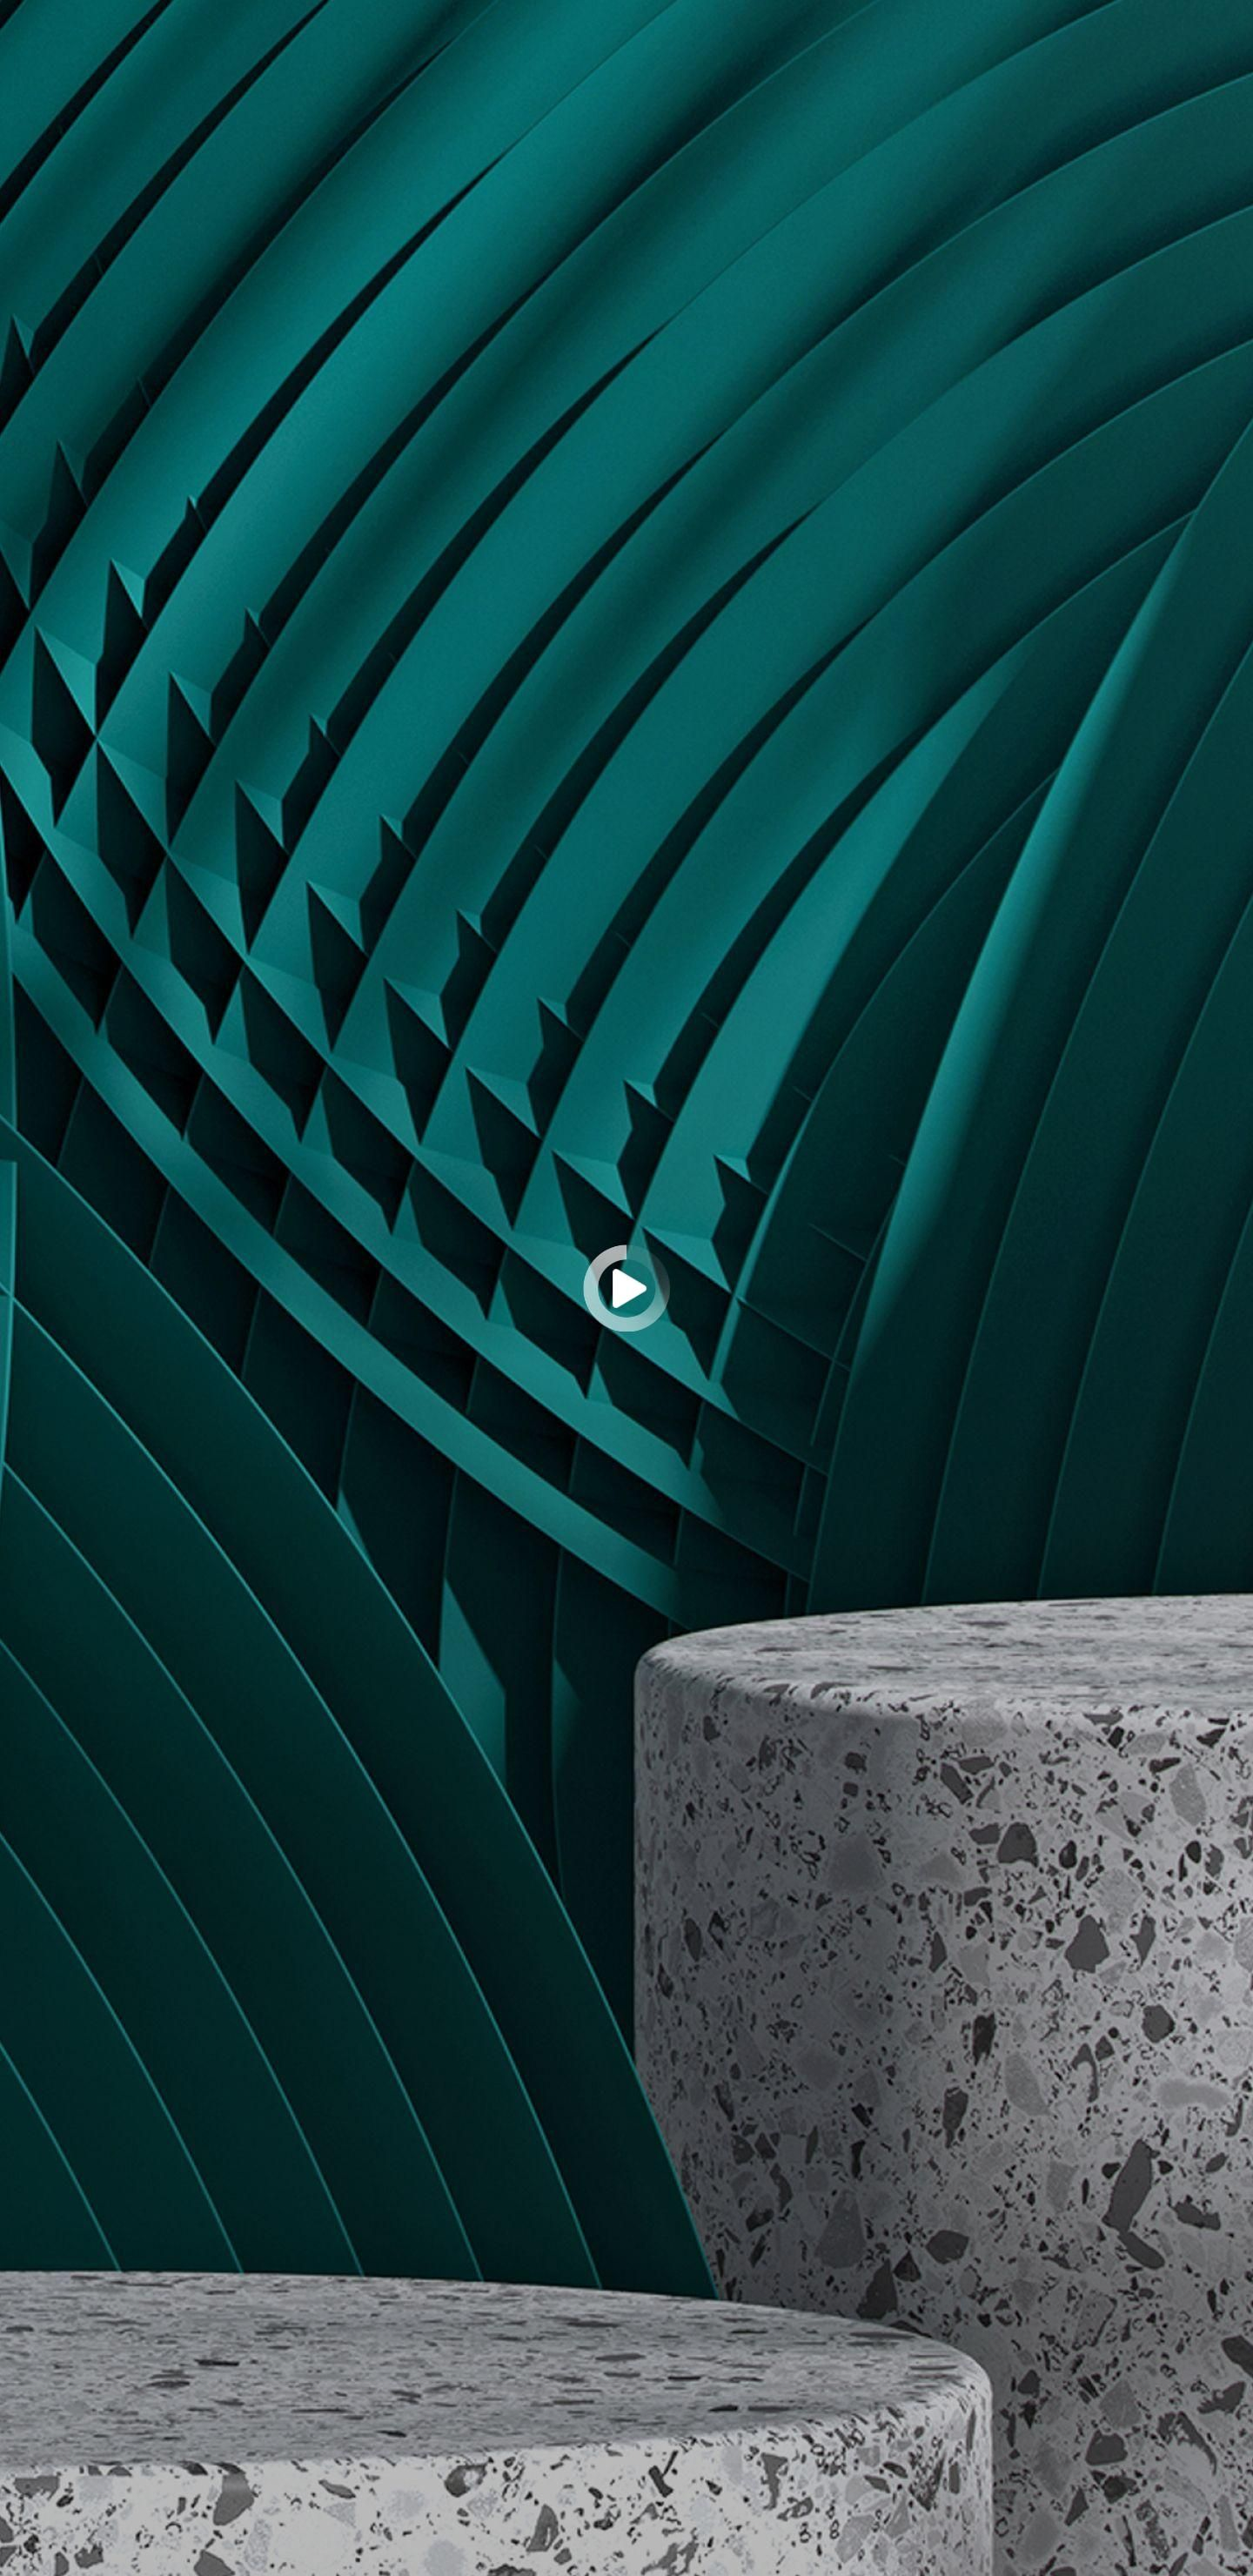 Papel De Parede Lilo Stitch Art Online Phonewallpaperquotes In 2021 Samsung Galaxy Wallpaper Stock Wallpaper Galaxy Wallpaper